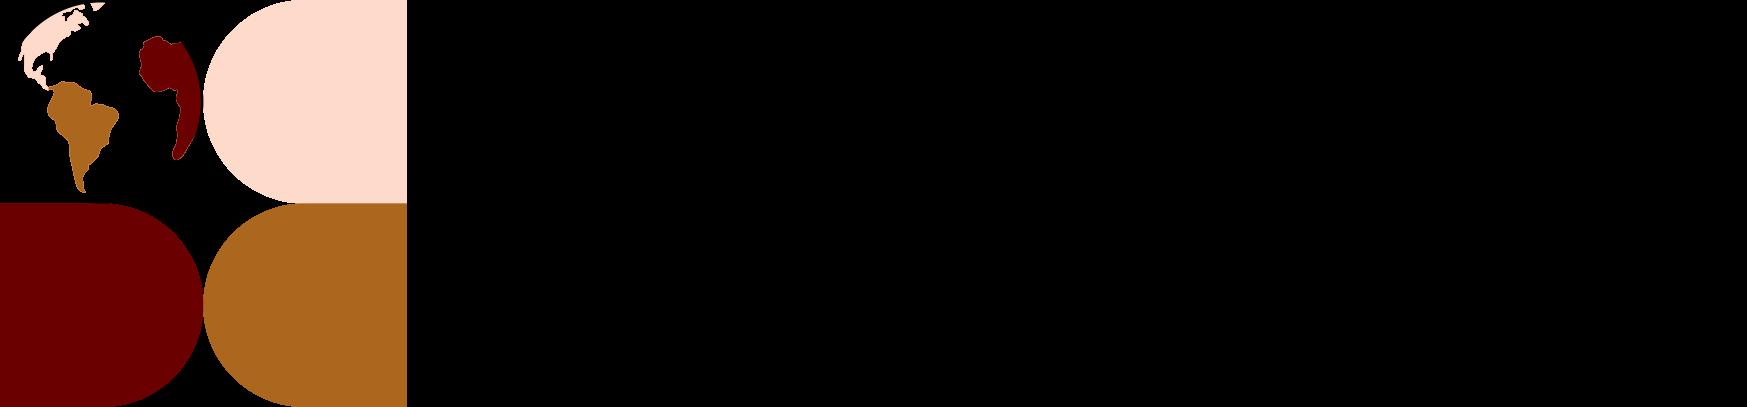 ACDC Kosovo logo